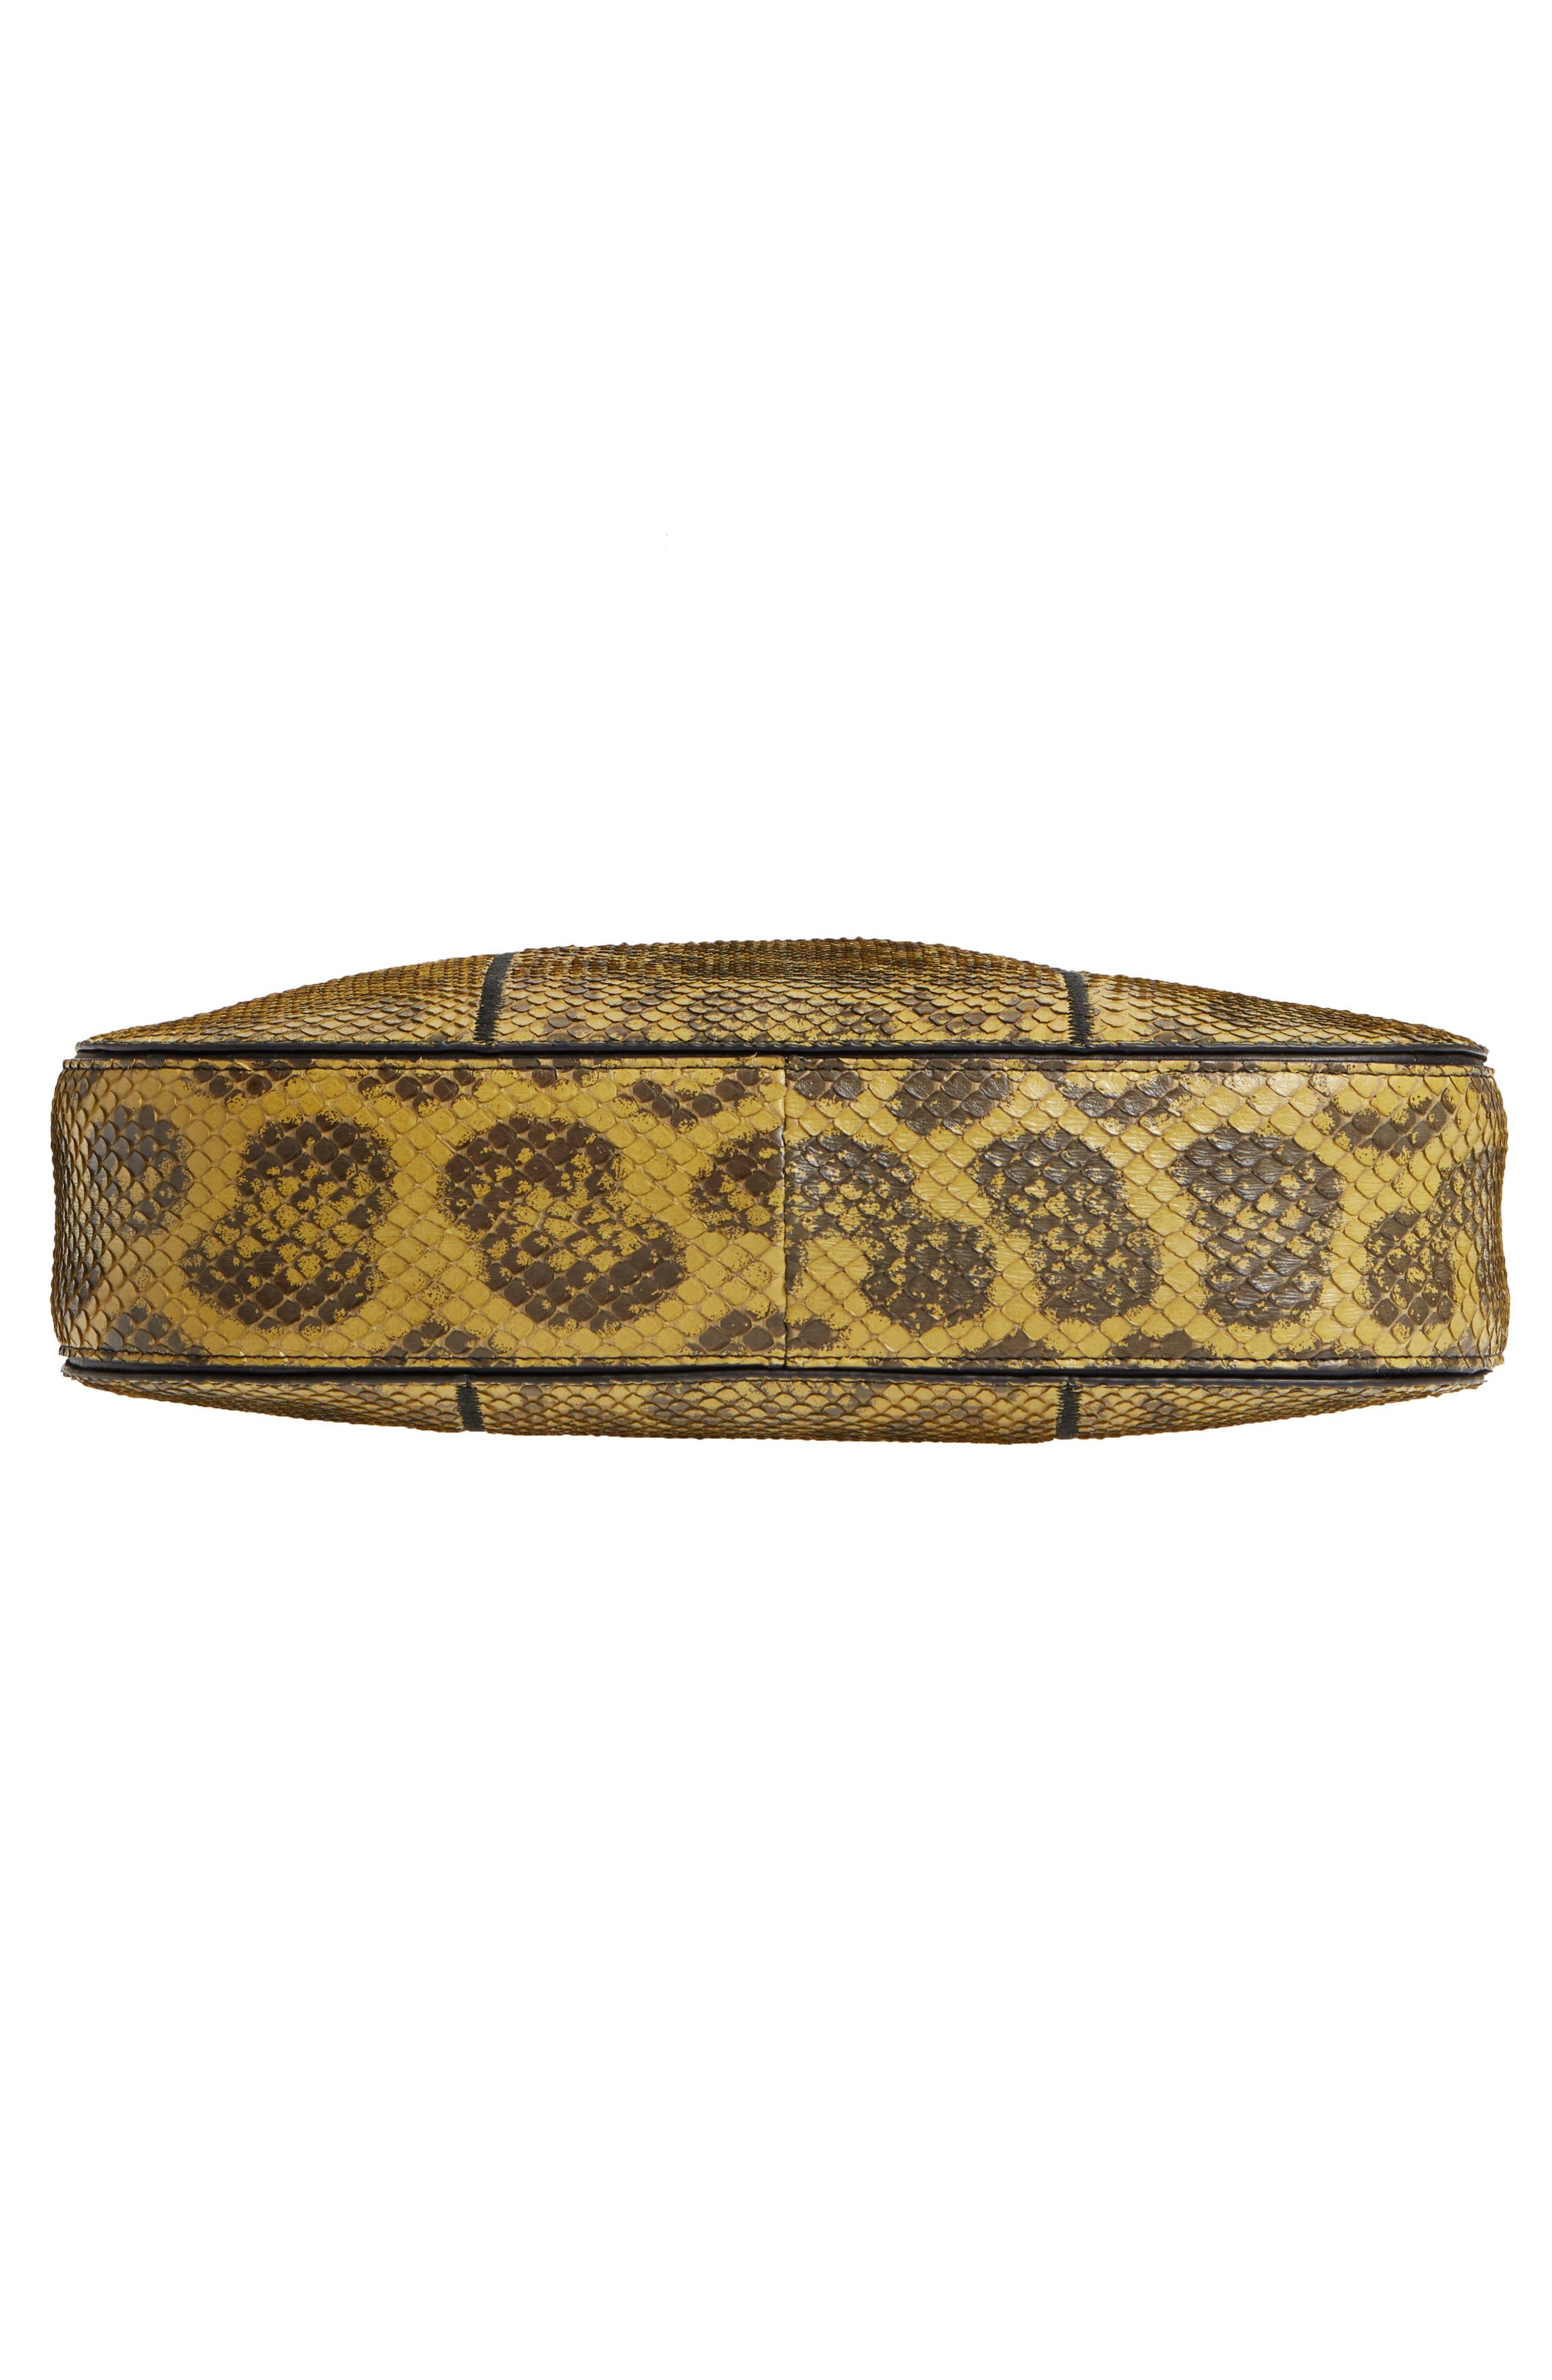 Small Loop Genuine Anaconda Snakeskin Leather Hobo,                             Alternate thumbnail 6, color,                             BLACKGOLD